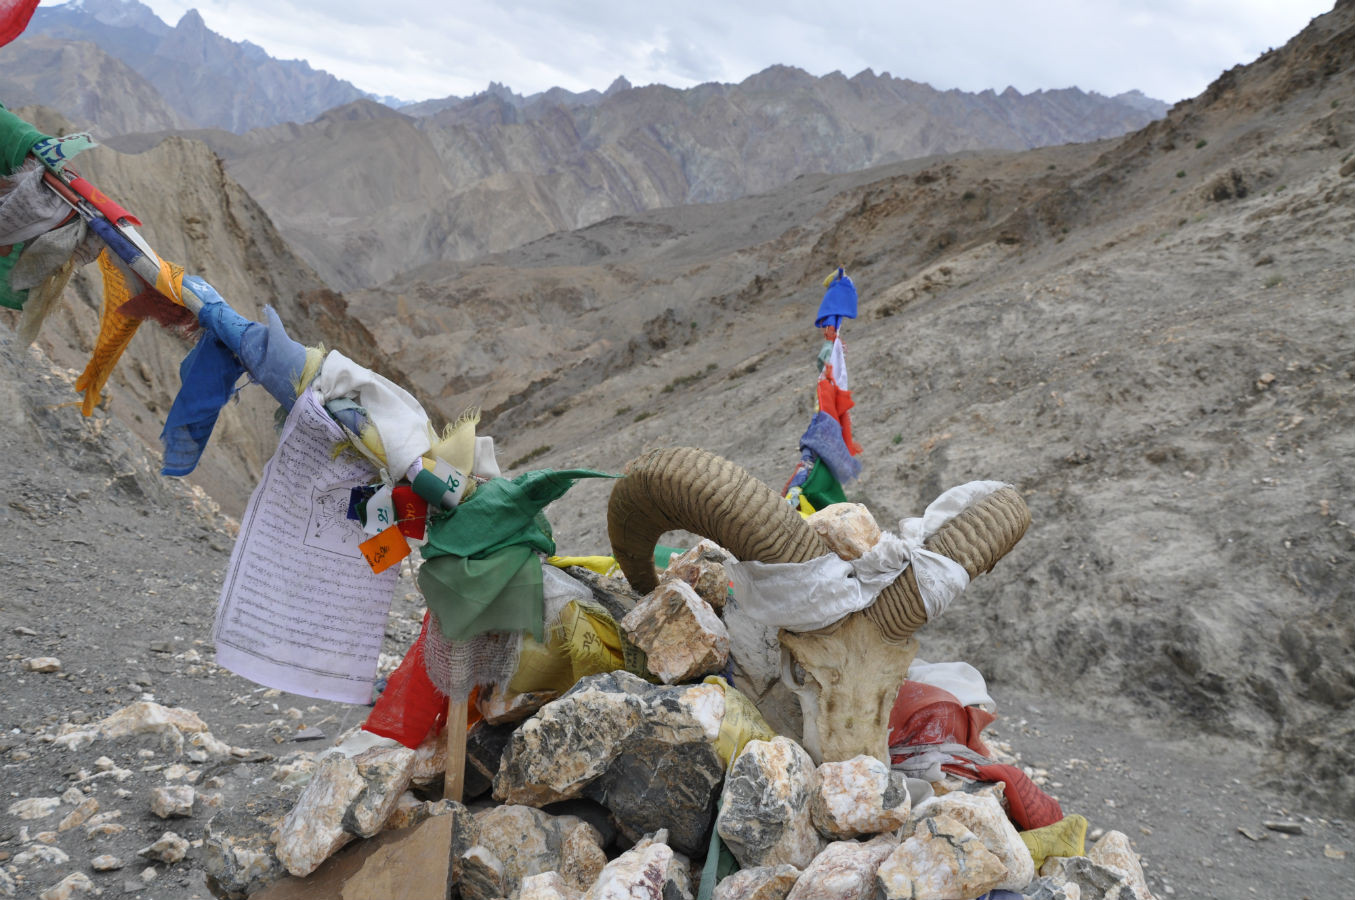 tibet indien wanderung wandern farbe gebirge